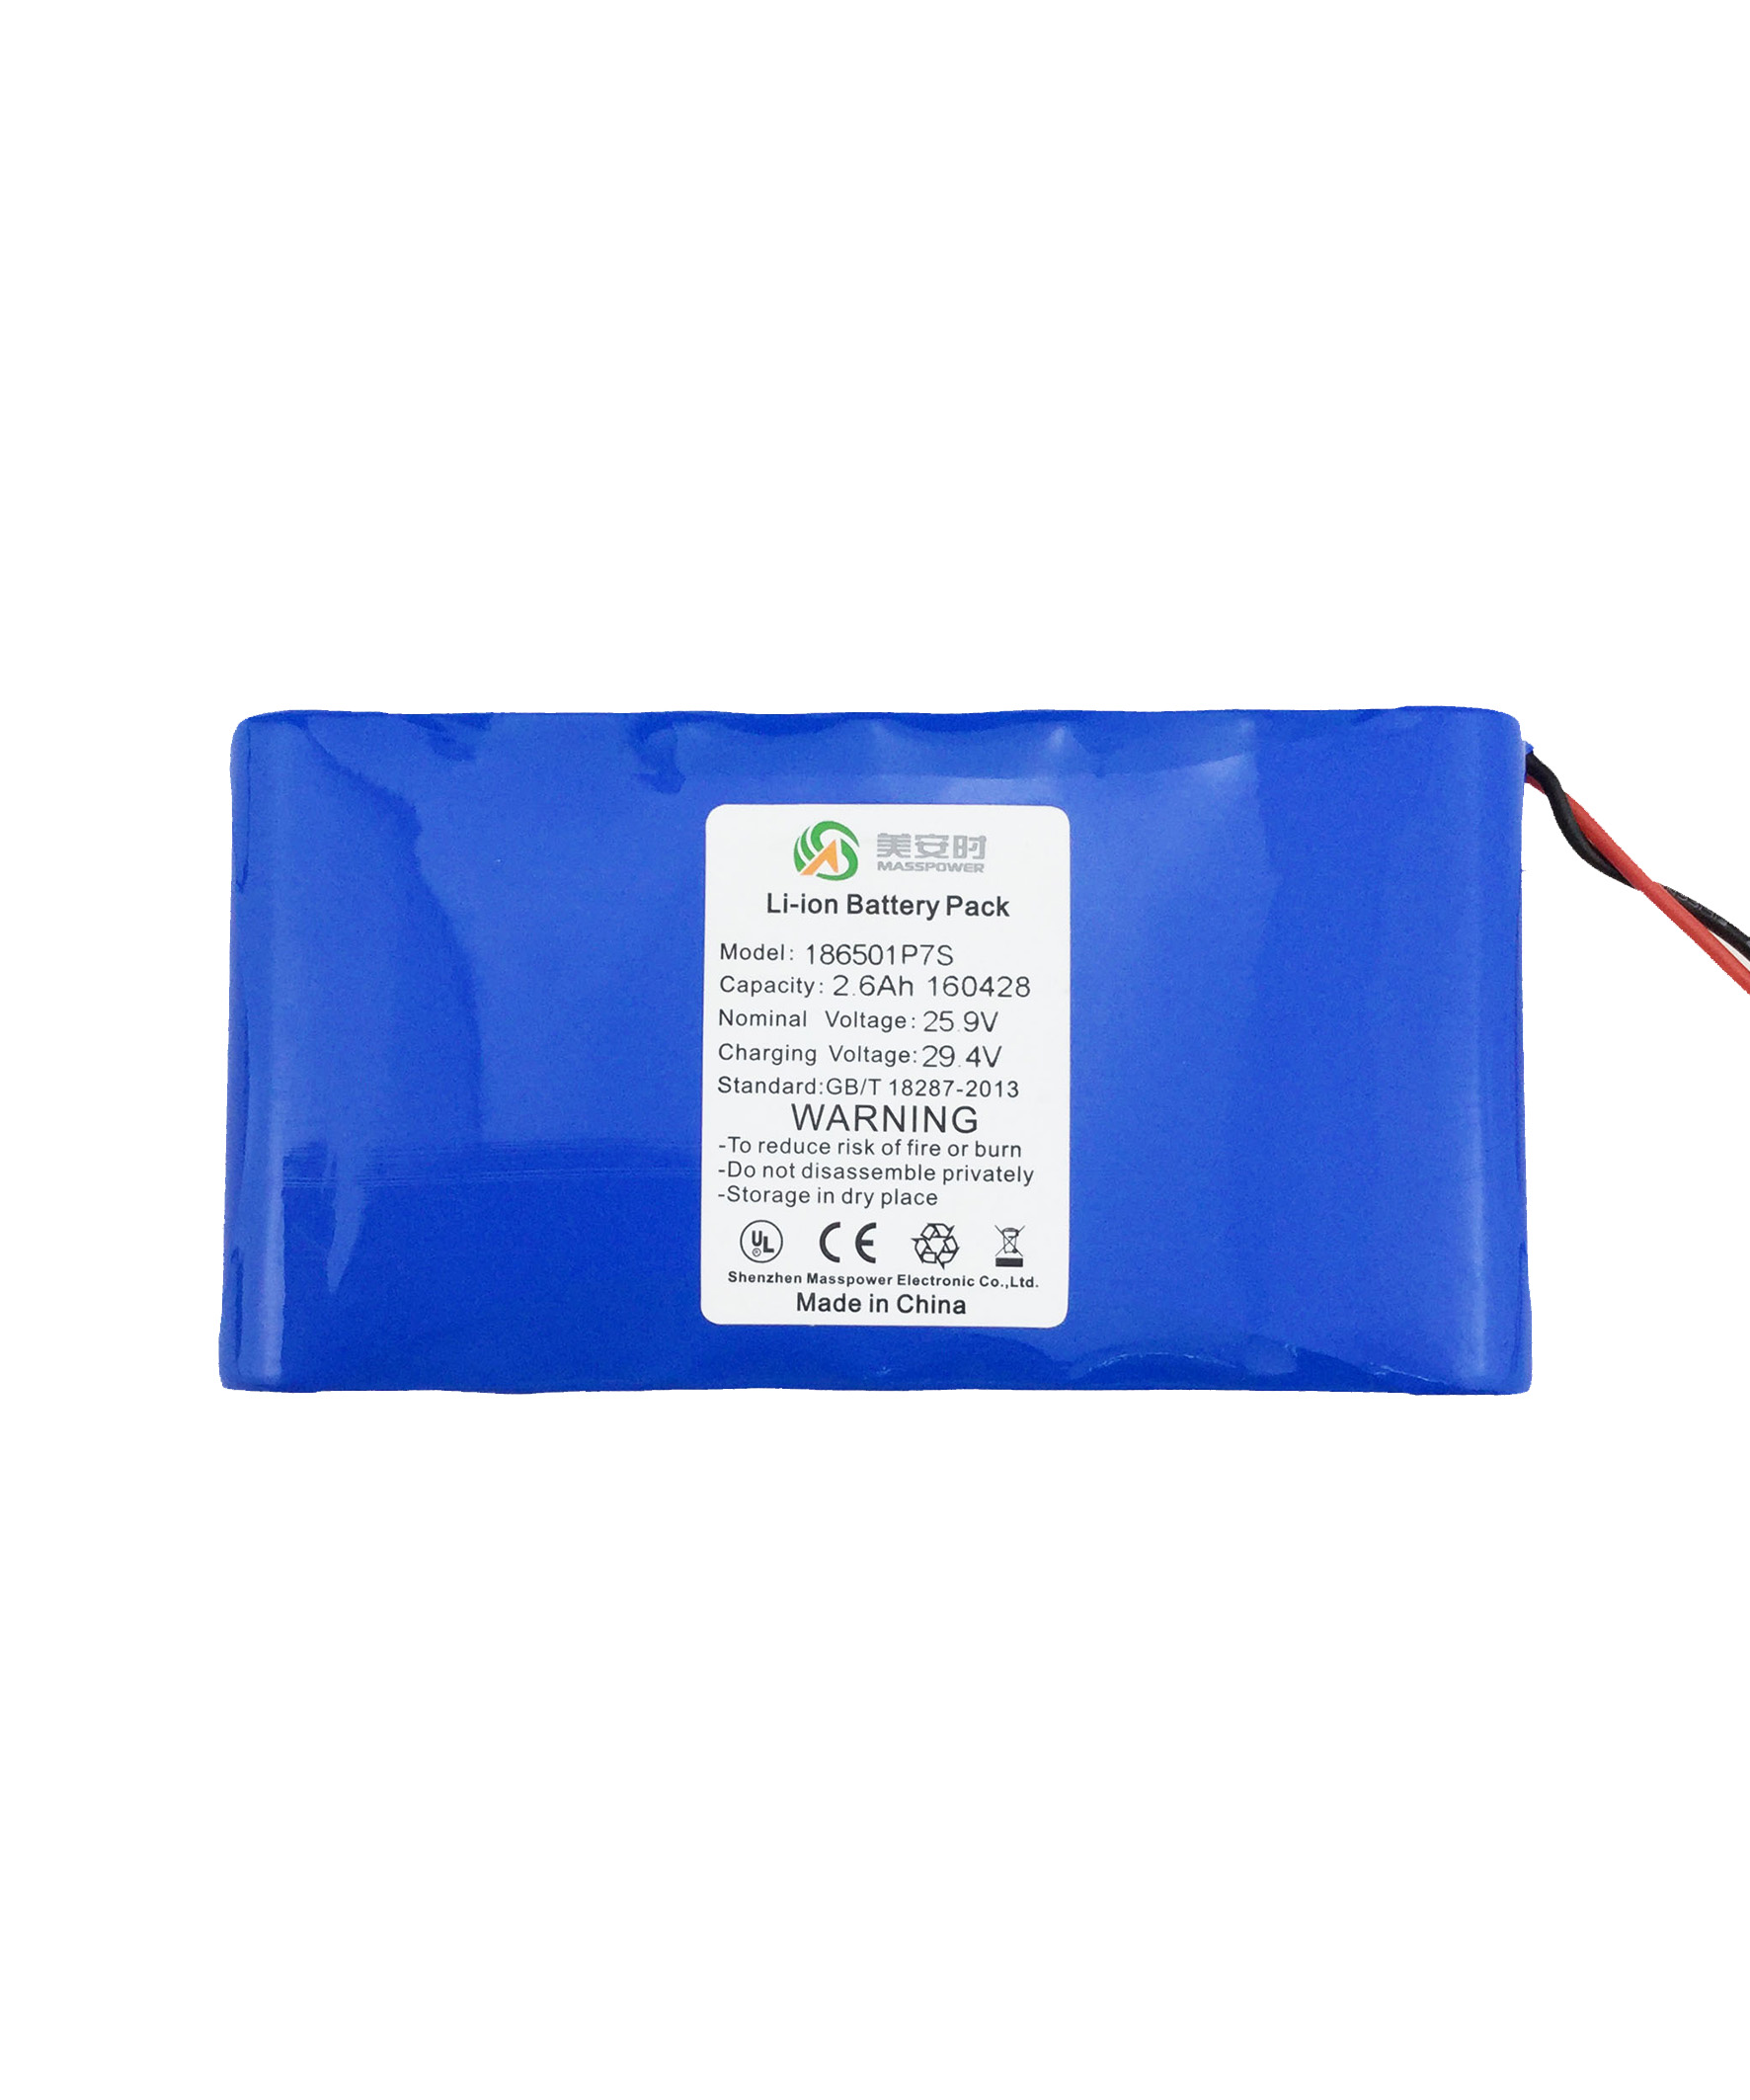 25.9V2.6Ah丨无线电通信设备锂电池